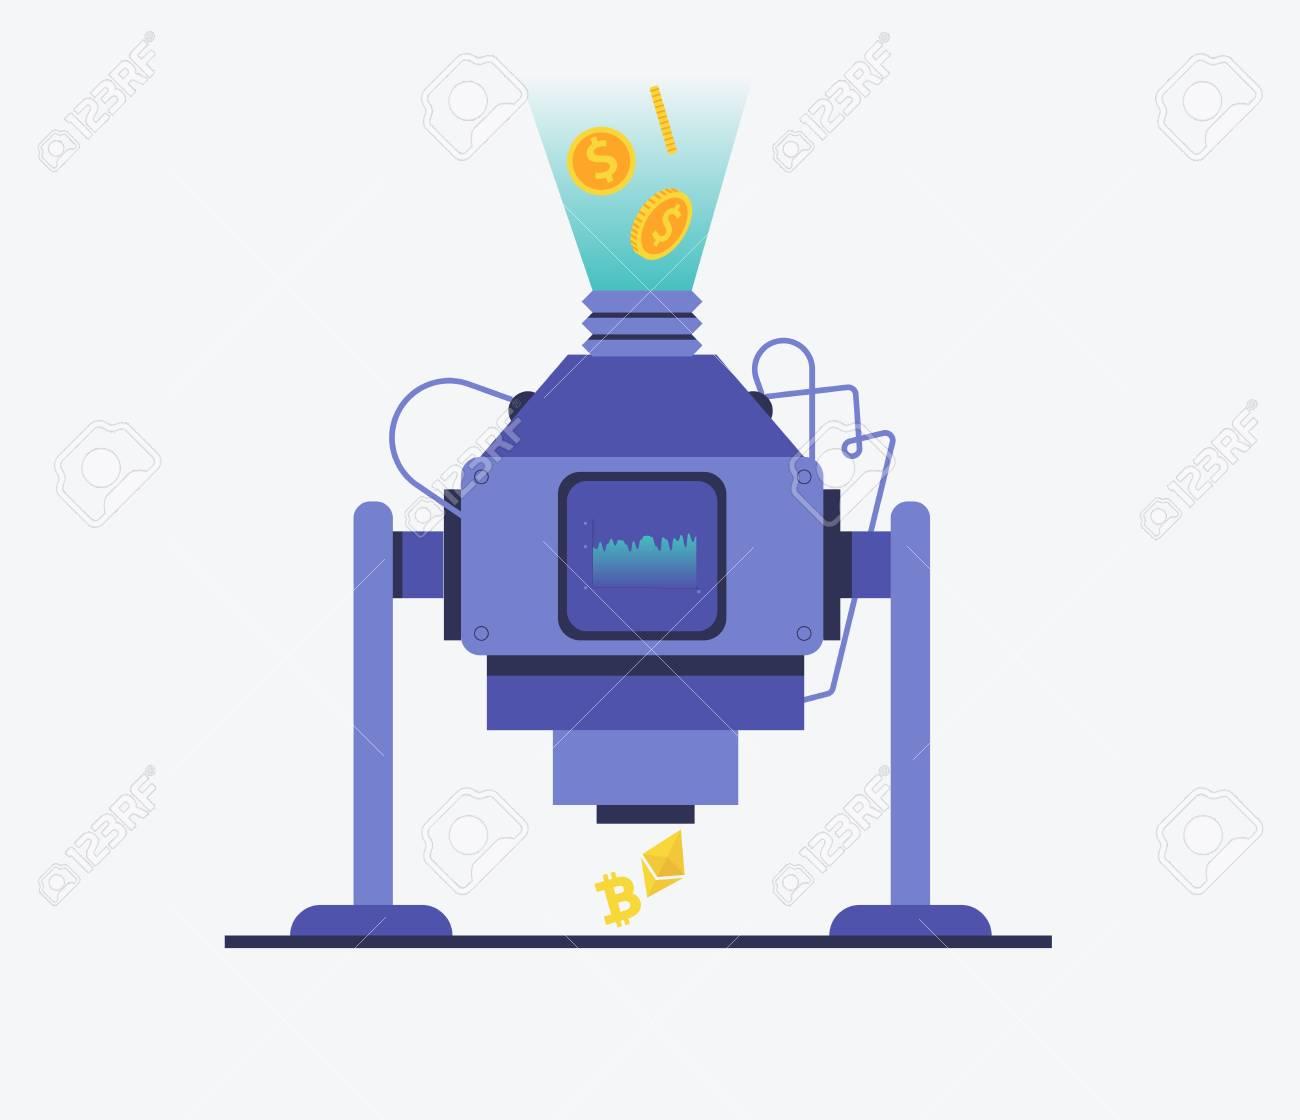 comercio de bitcoins con una máquina virtual sistemas de negociação automatizados